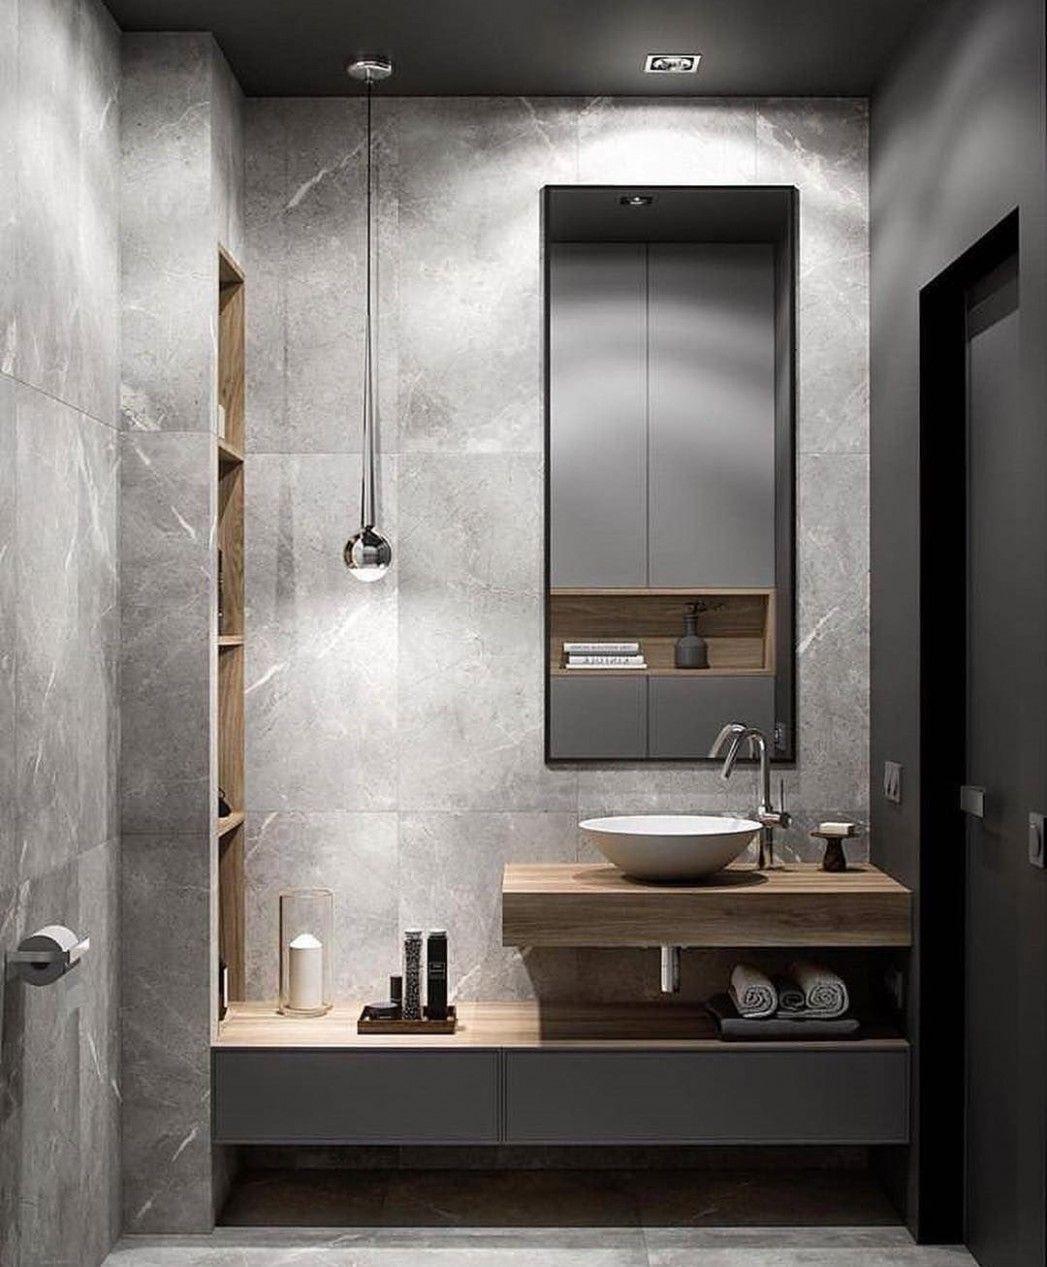 Modern Bathroom Images Photos Modern Bathroom Design Modern Bathroom Bathroom Design Bathroom design ideas philippines